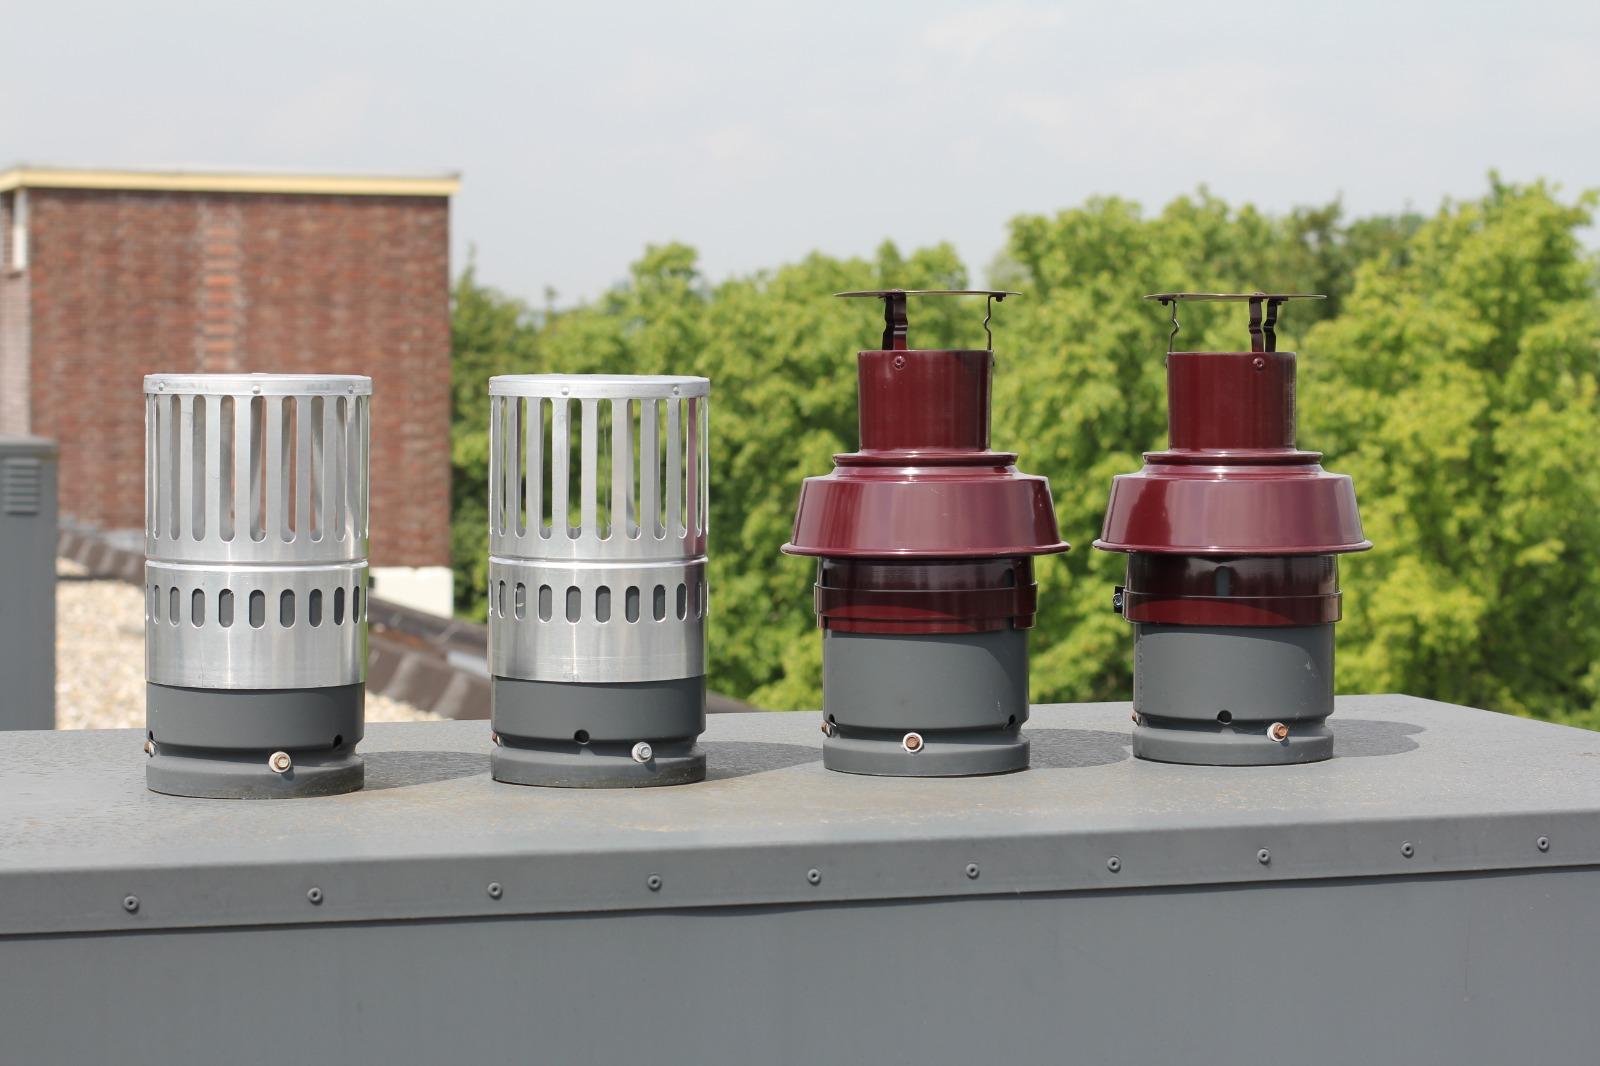 Ventilaitietechniek ventilatie